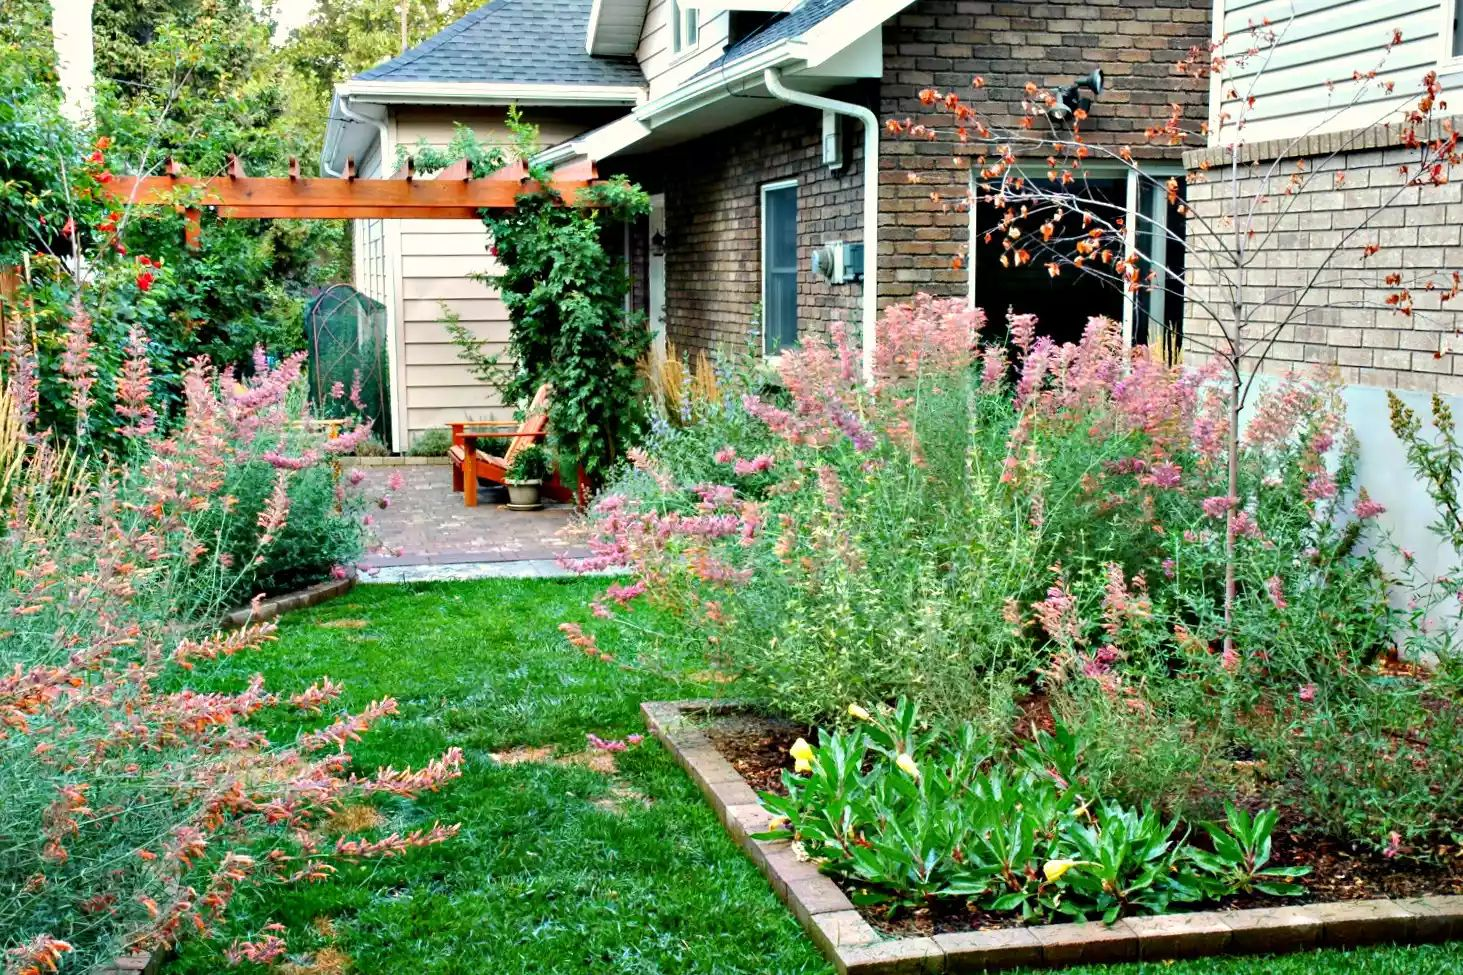 Small Urban Backyard -   Beautiful Low Maintenance Front Yard Garden and Landscaping Ideas